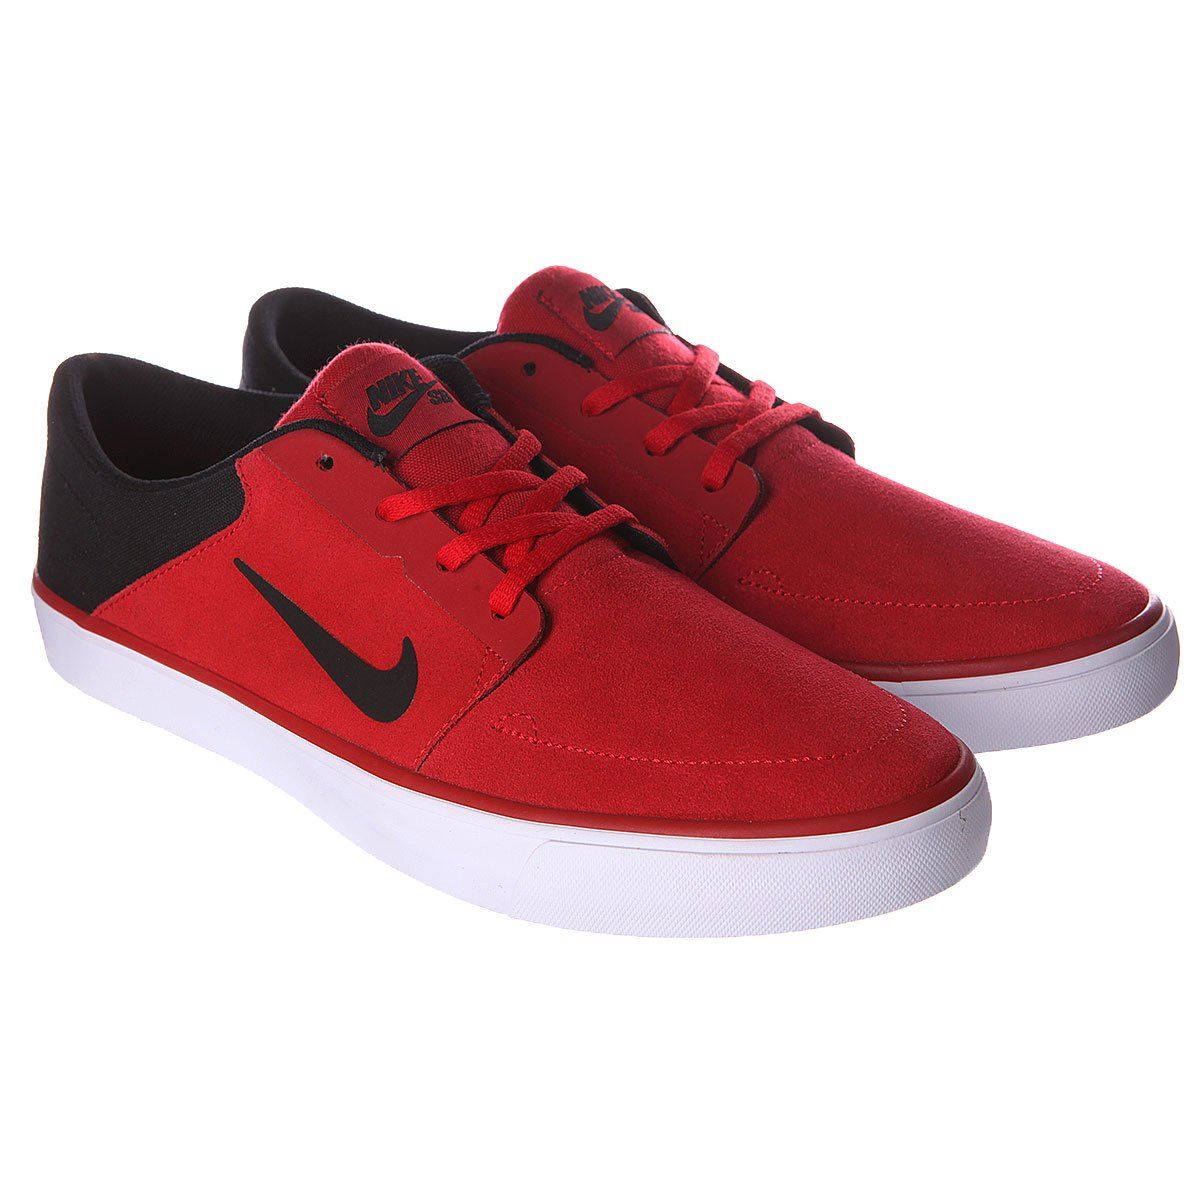 c230ce8576b3 Купить кеды Nike Sb Portmore Gym Red Black White (725027-601) в ...